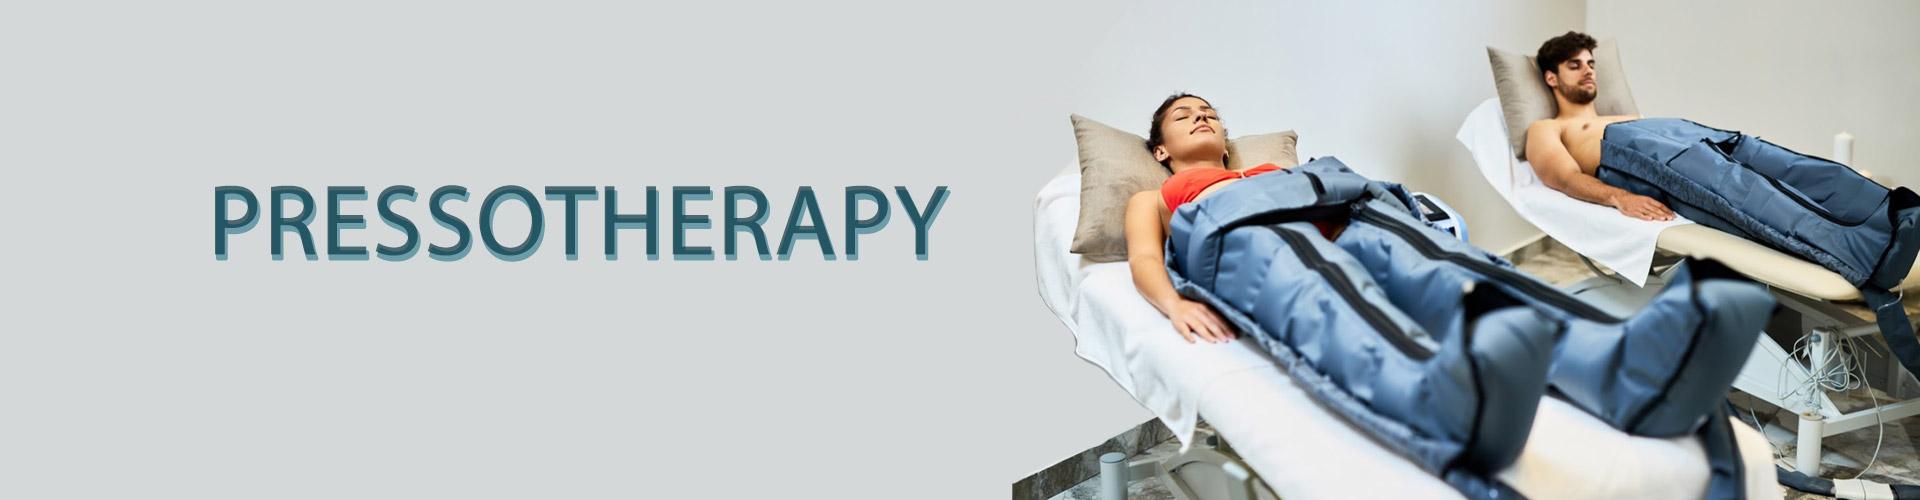 https://www.cosmesurge.com/wp-content/uploads/2020/12/banner-pressotherapy.jpg